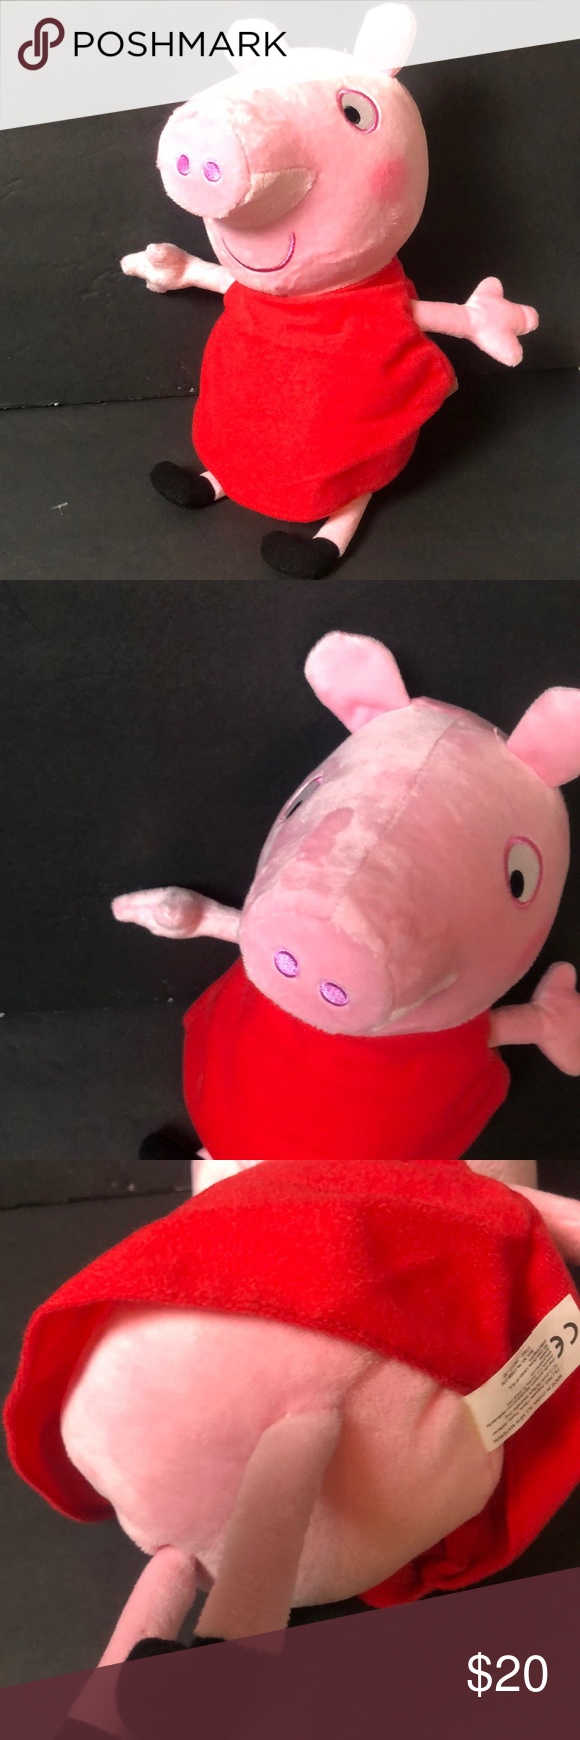 Build A Bear Peppa Pig Large Stuffed Plush Toy Animal New With Tags In Stock Now At Https Www Bonanza Com Custom Stuffed Animal Teddy Bear Shop Build A Bear [ 2878 x 2160 Pixel ]